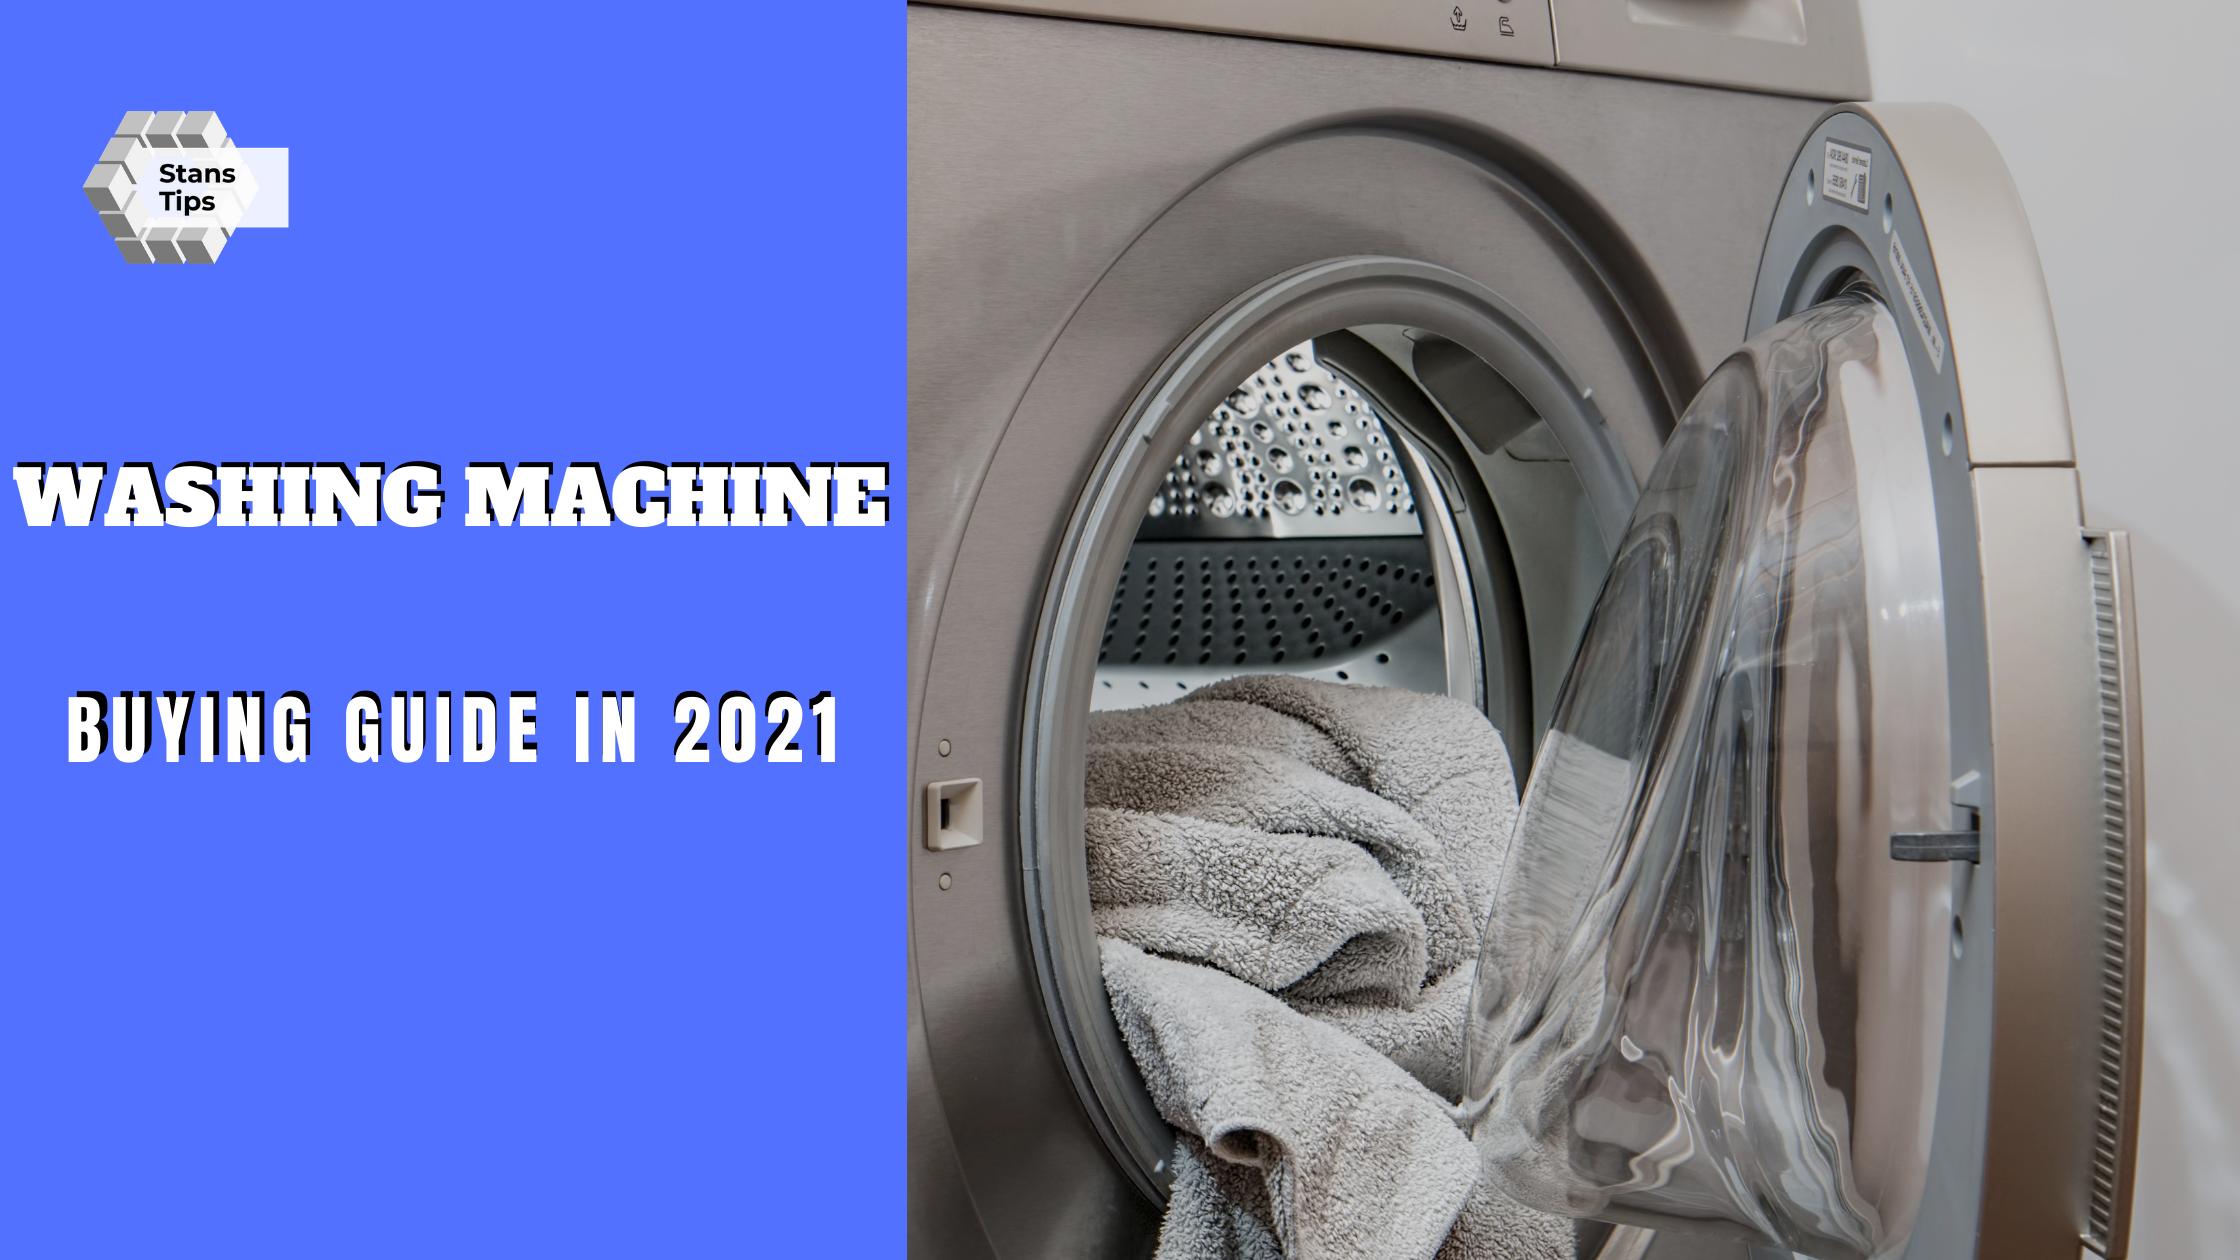 Washing machine buying guide in 2021